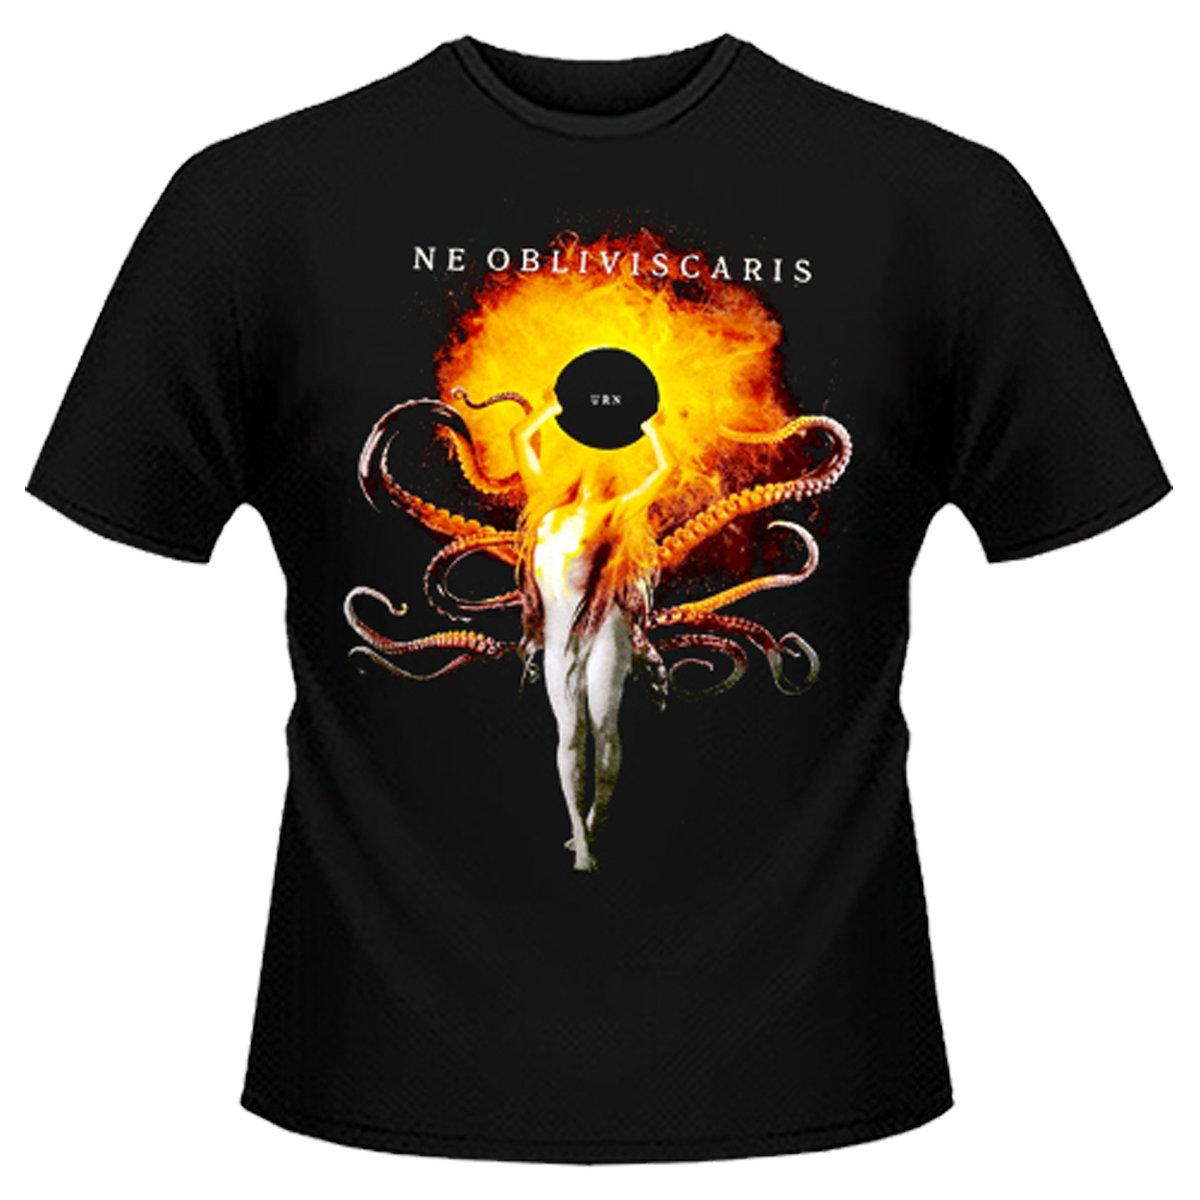 Urn T Shirt Ne Obliviscaris